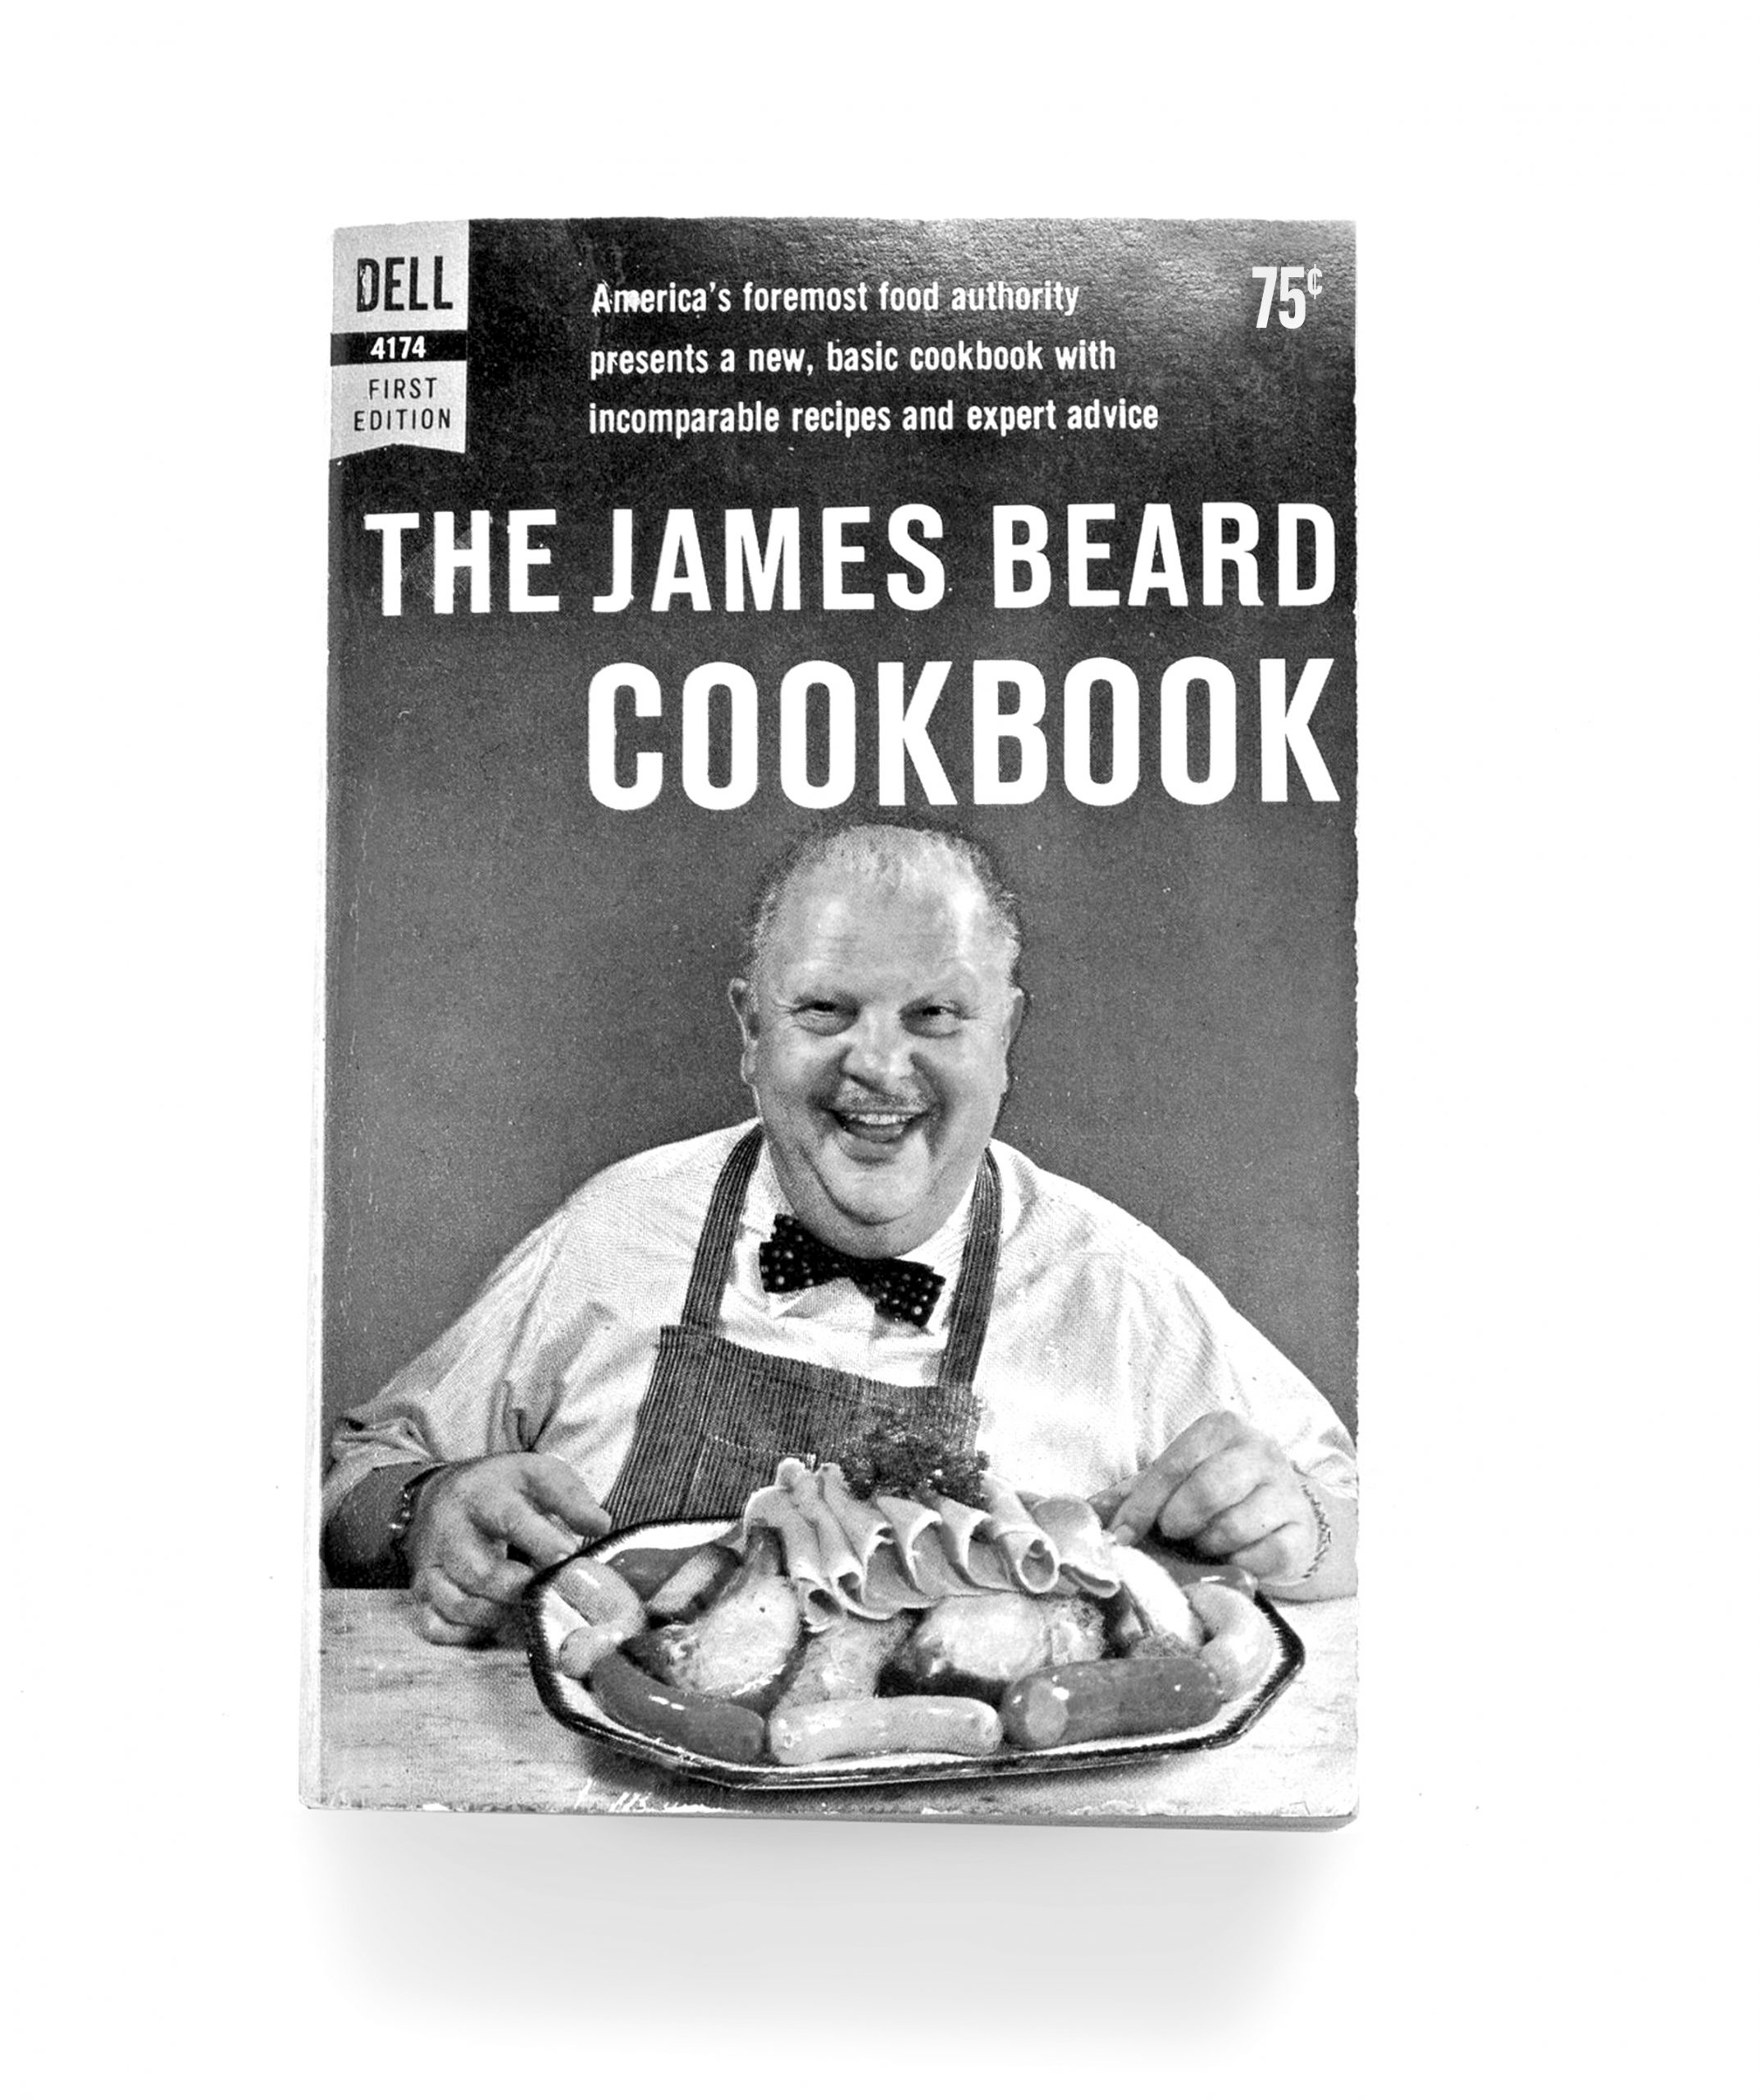 image for profile of James Beard